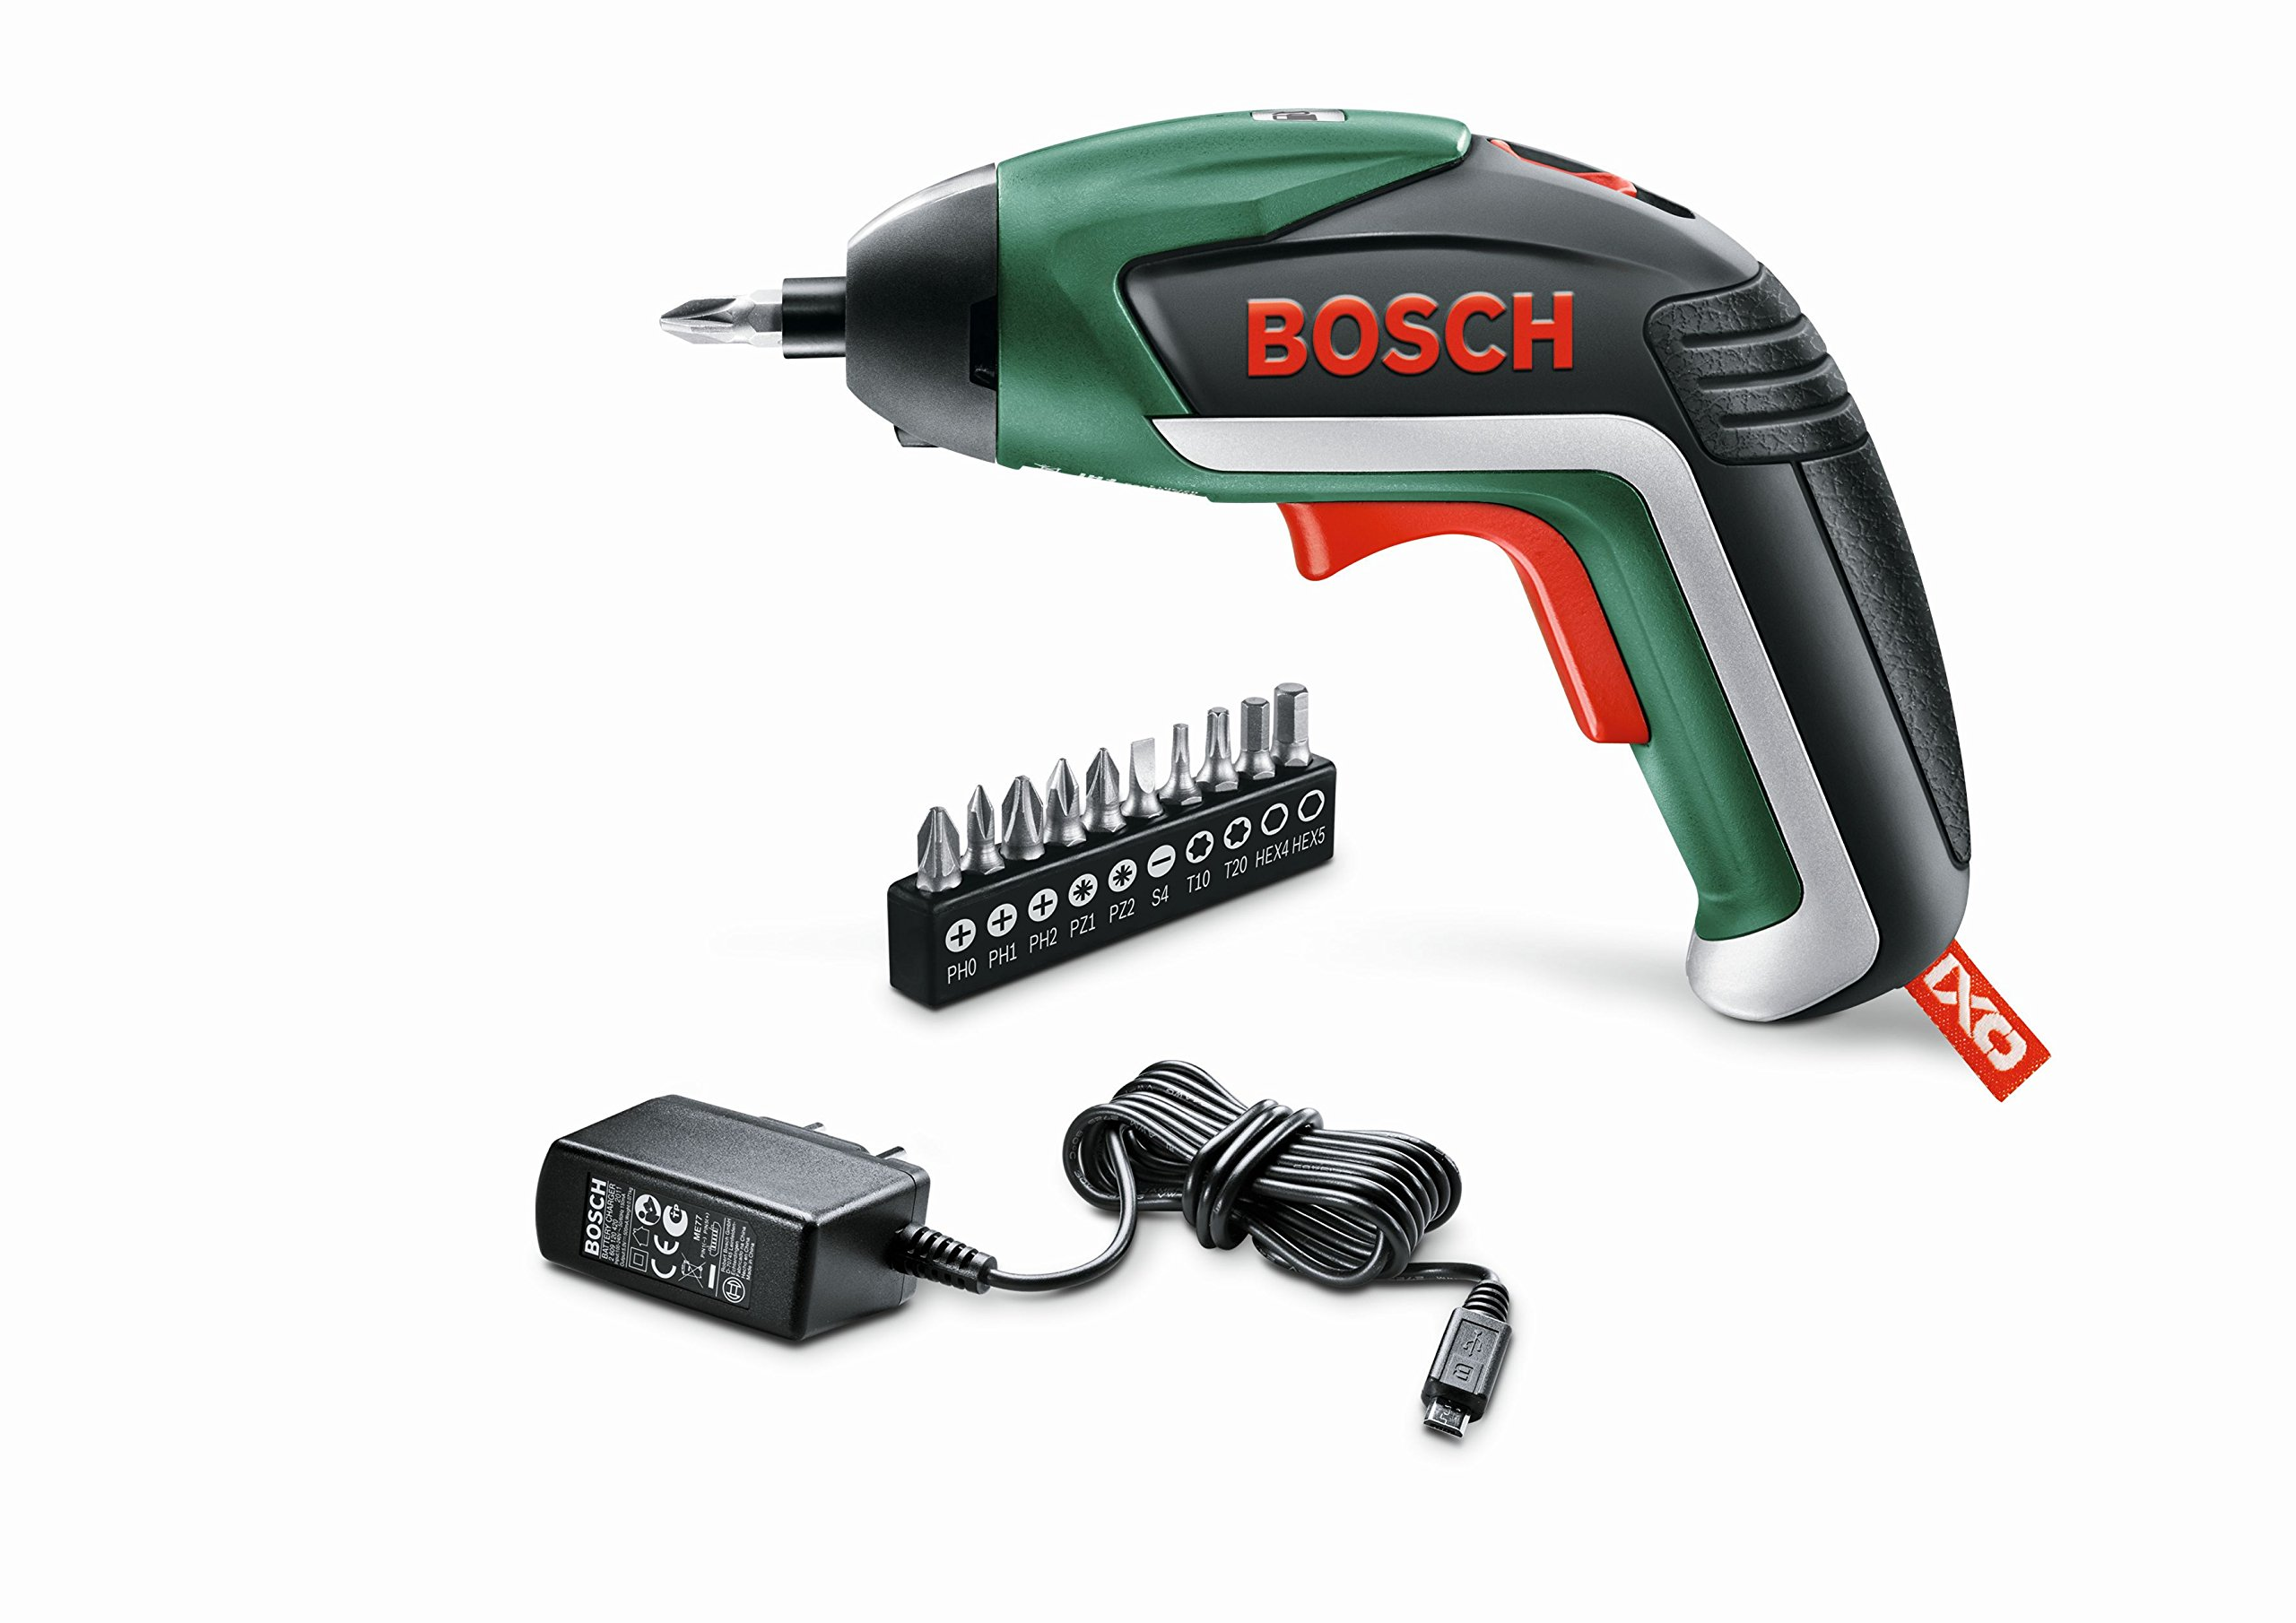 Bosch-6039A8006-IXO-V-Basic-36-Carton-Akkuschrauber-100-W-36-V